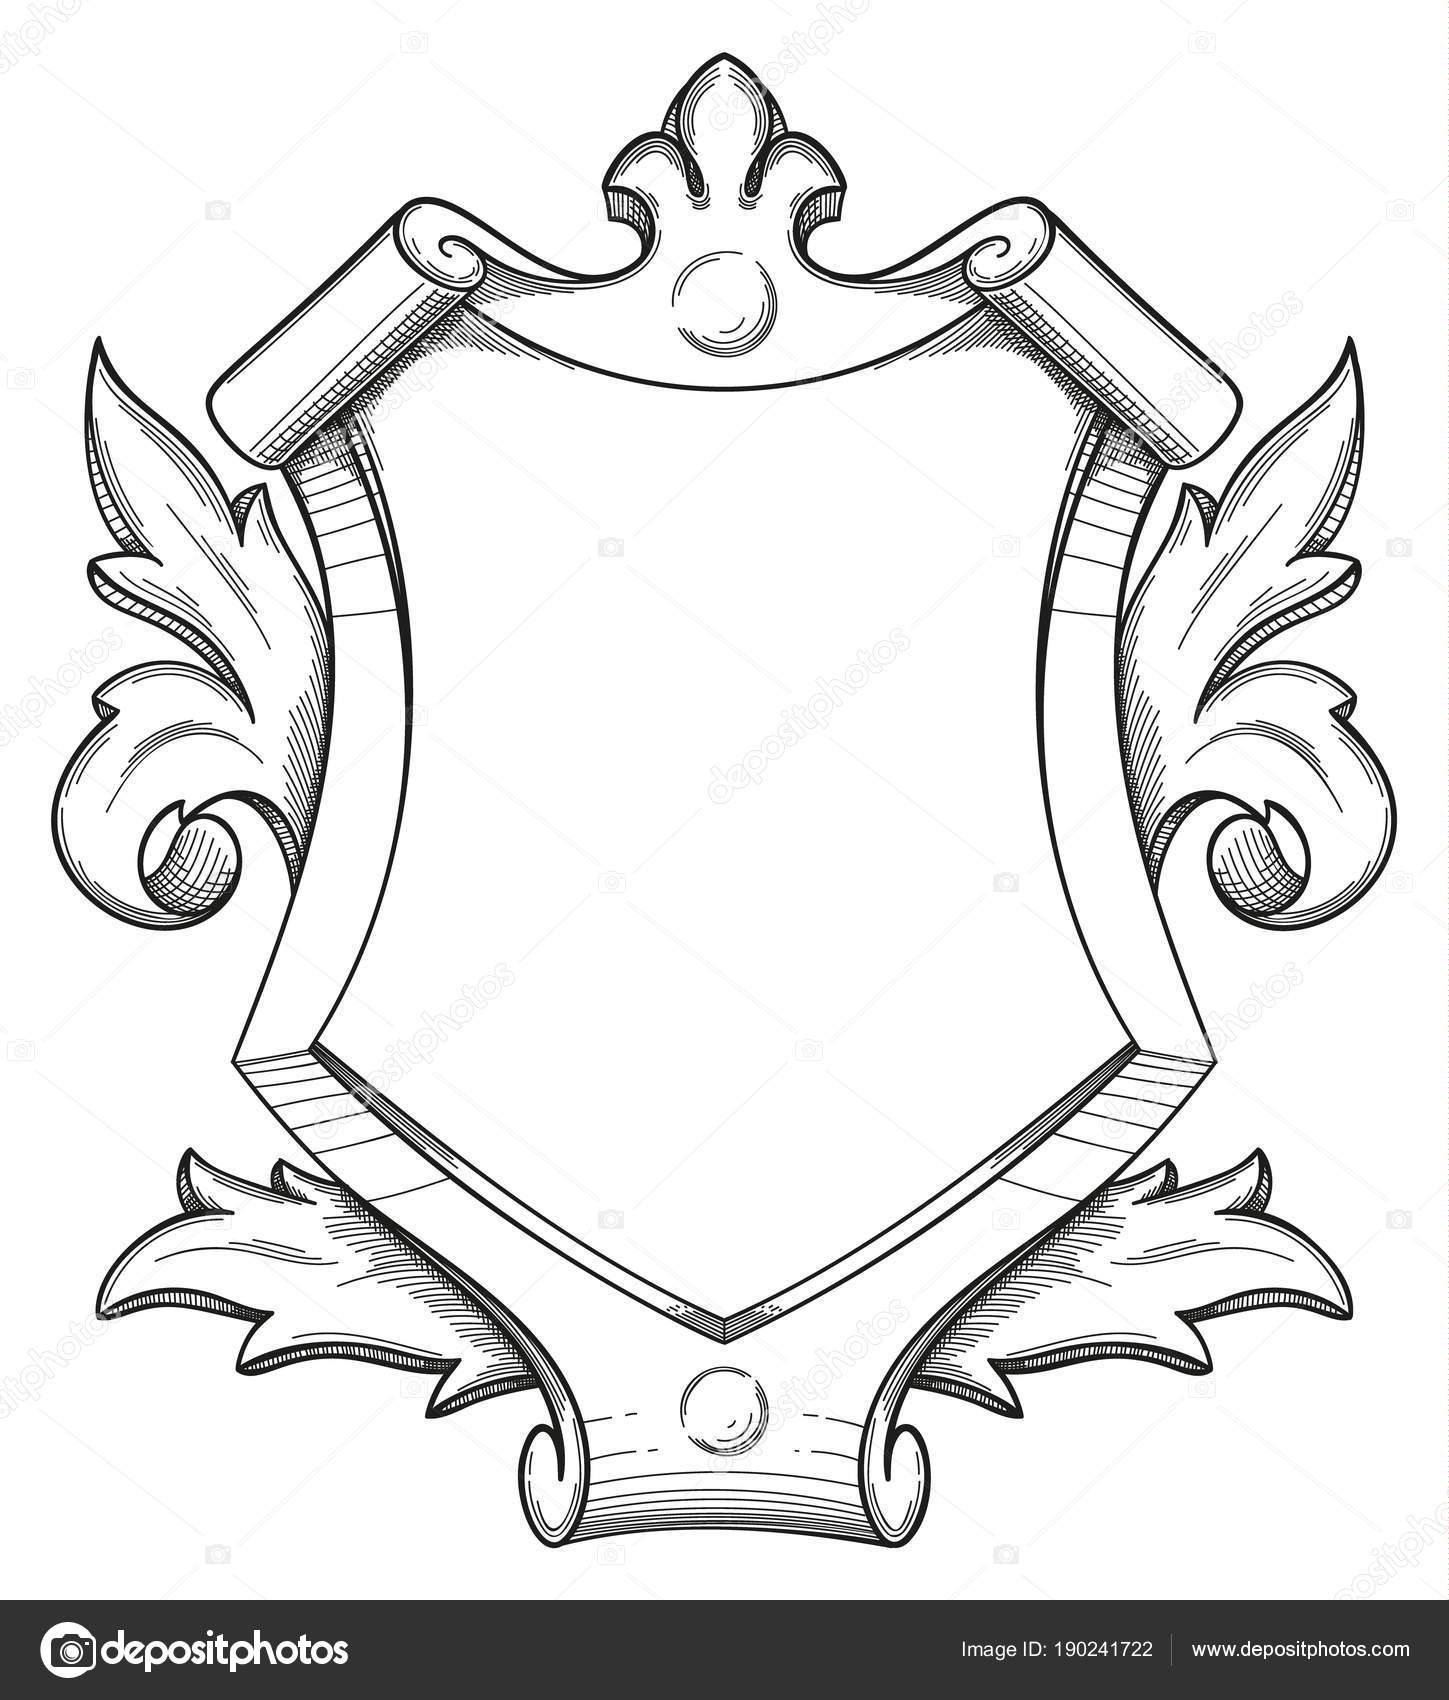 Dibujo de escudo barroco — Vector de stock © zayatsandzayats #190241722